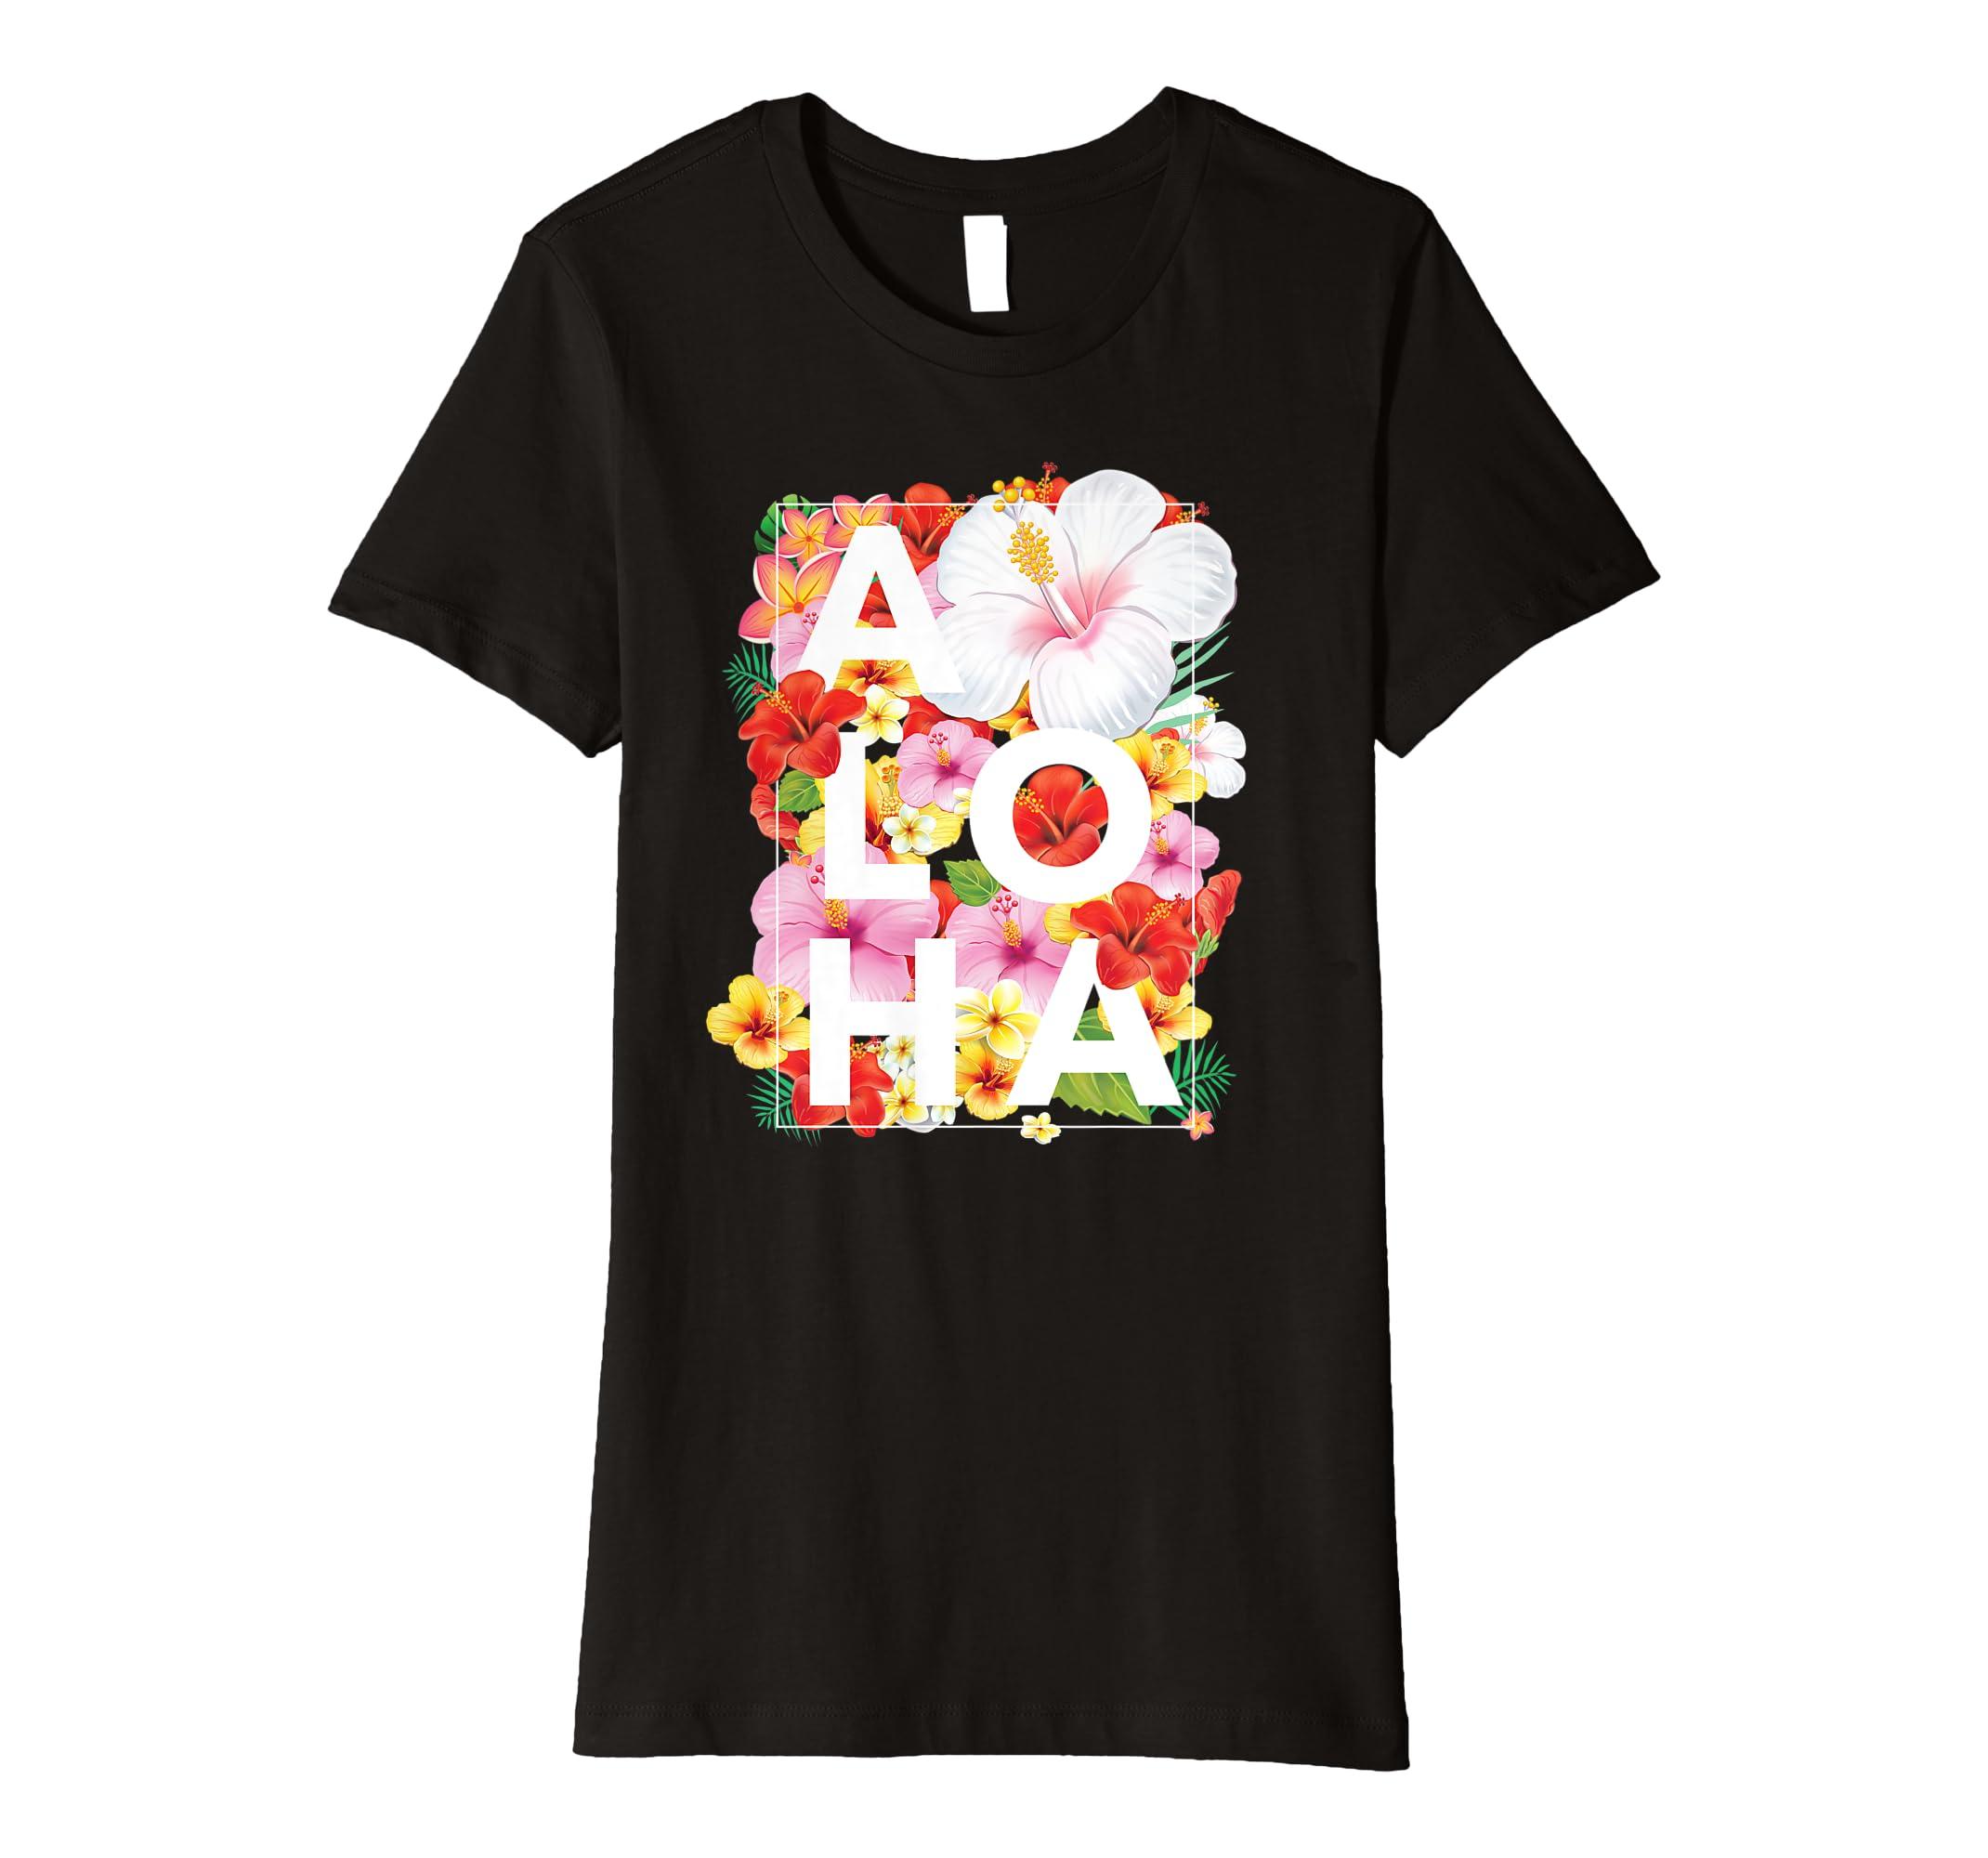 ead6b3a4f135 Amazon.com: Large Floral Flower Aloha Hawaii T-Shirt: Clothing